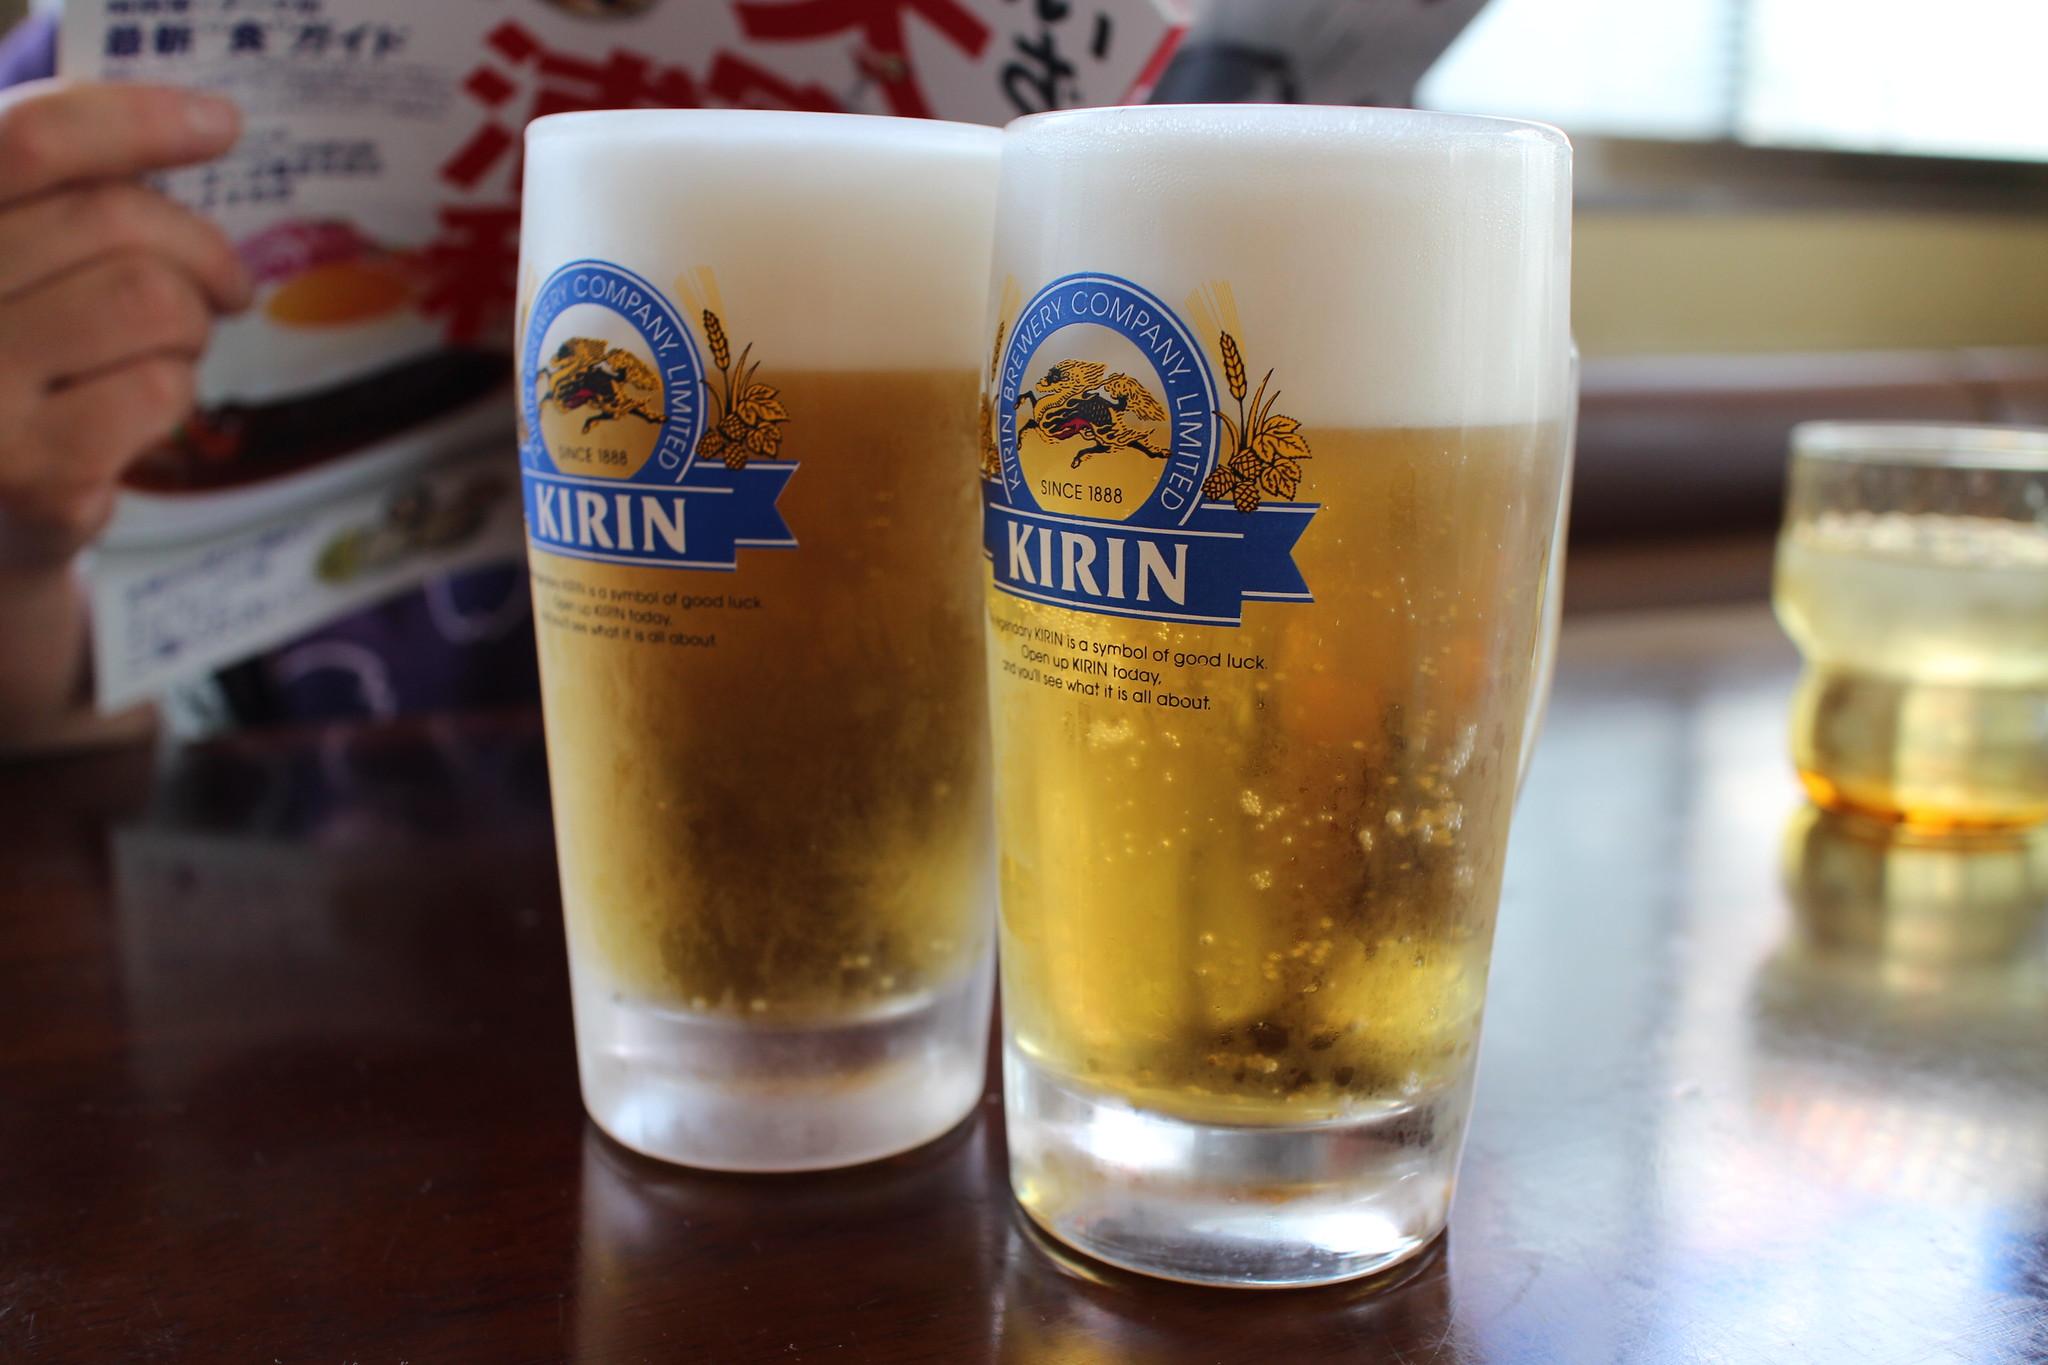 kirin beer 啤酒(圖/makipapa/CC BY-NC-ND 2.0)